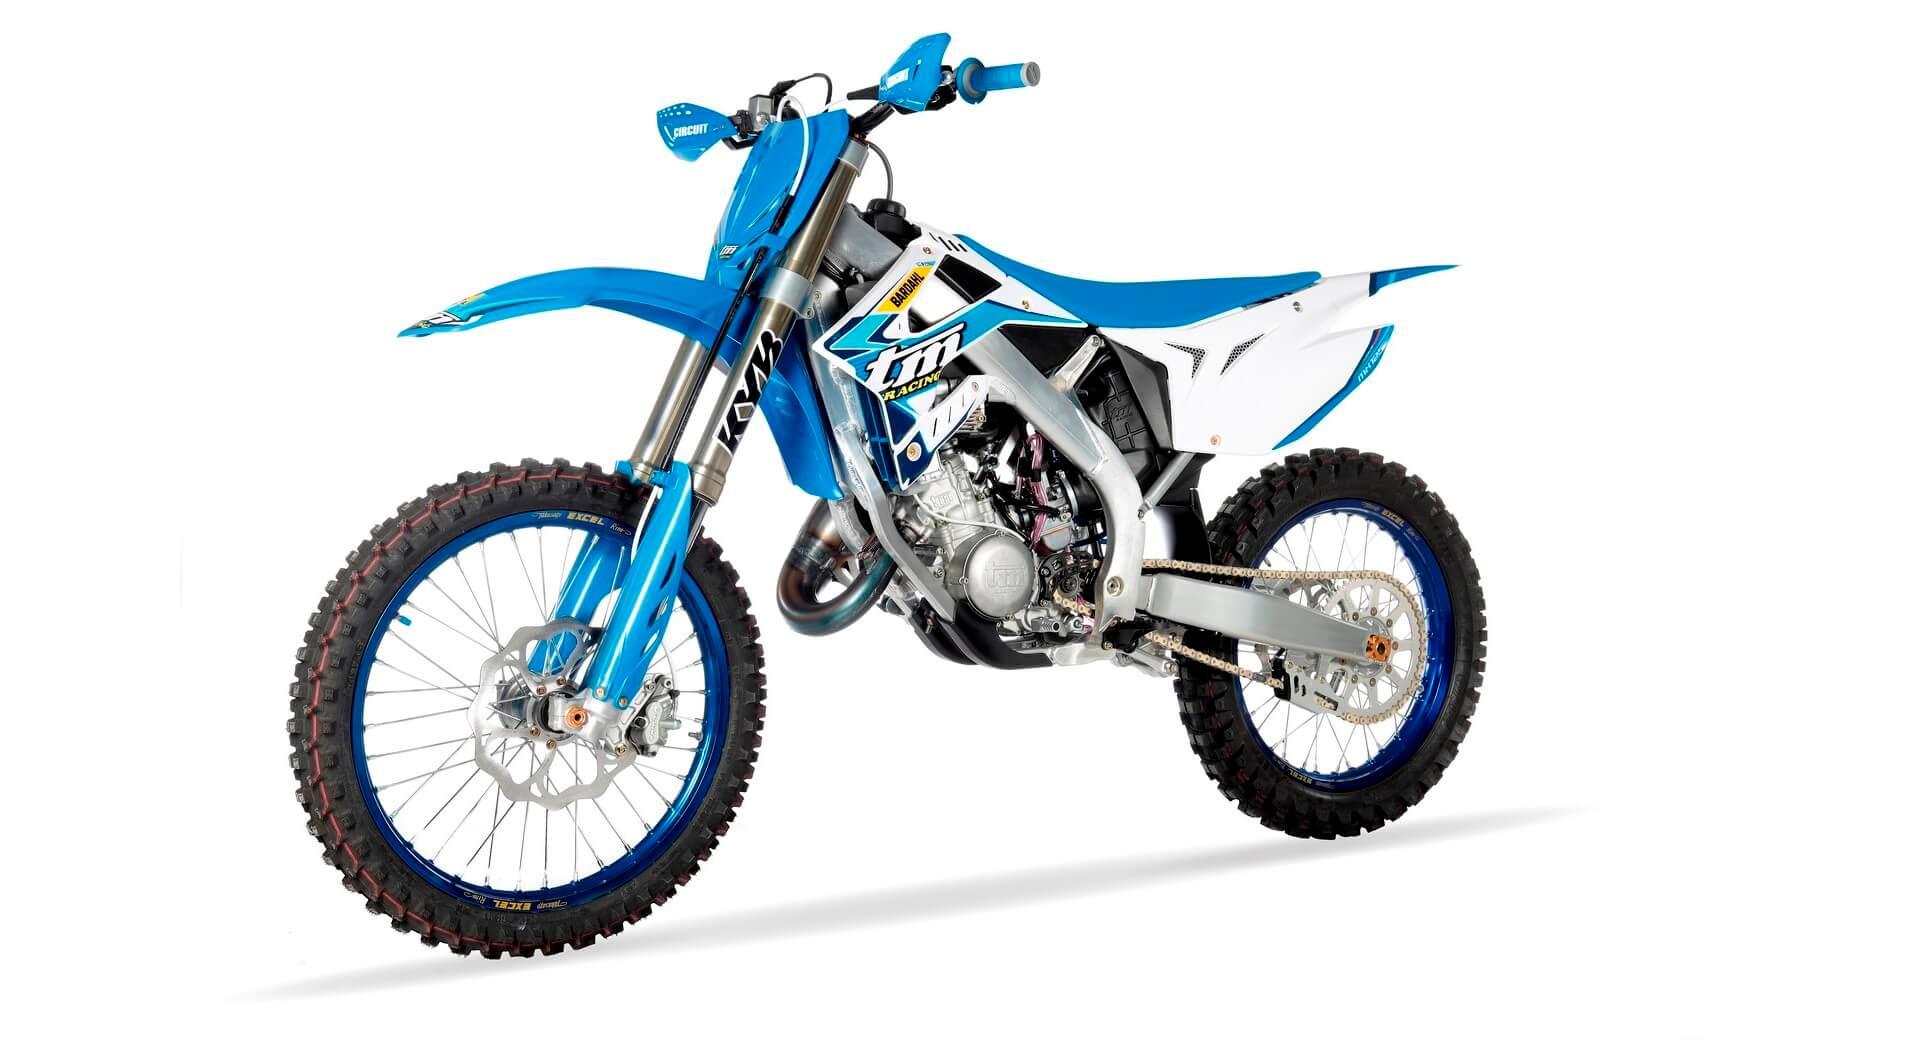 MX 125 2T 03